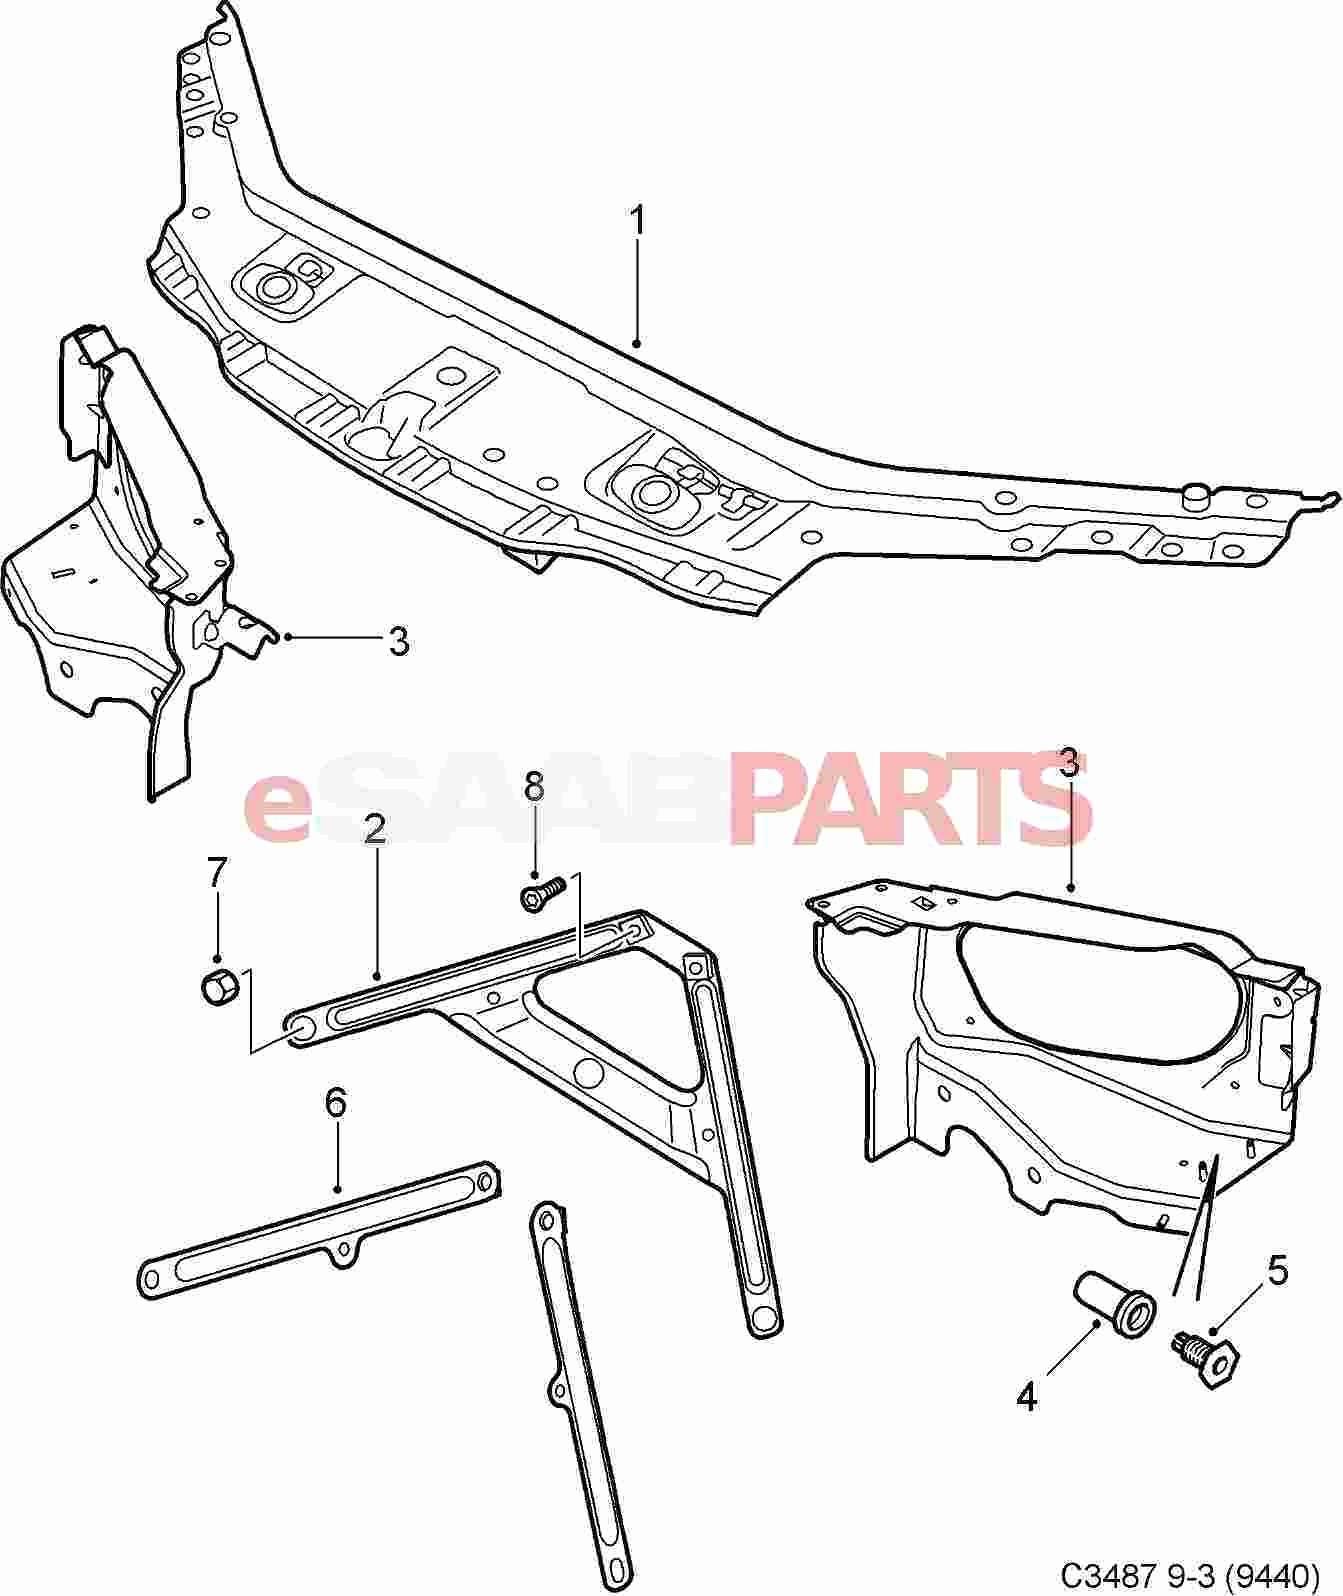 Car Body Diagram Parts Car Exterior Body Parts Diagram Awesome Esaabparts Saab 9 3 9440 Car Of Car Body Diagram Parts